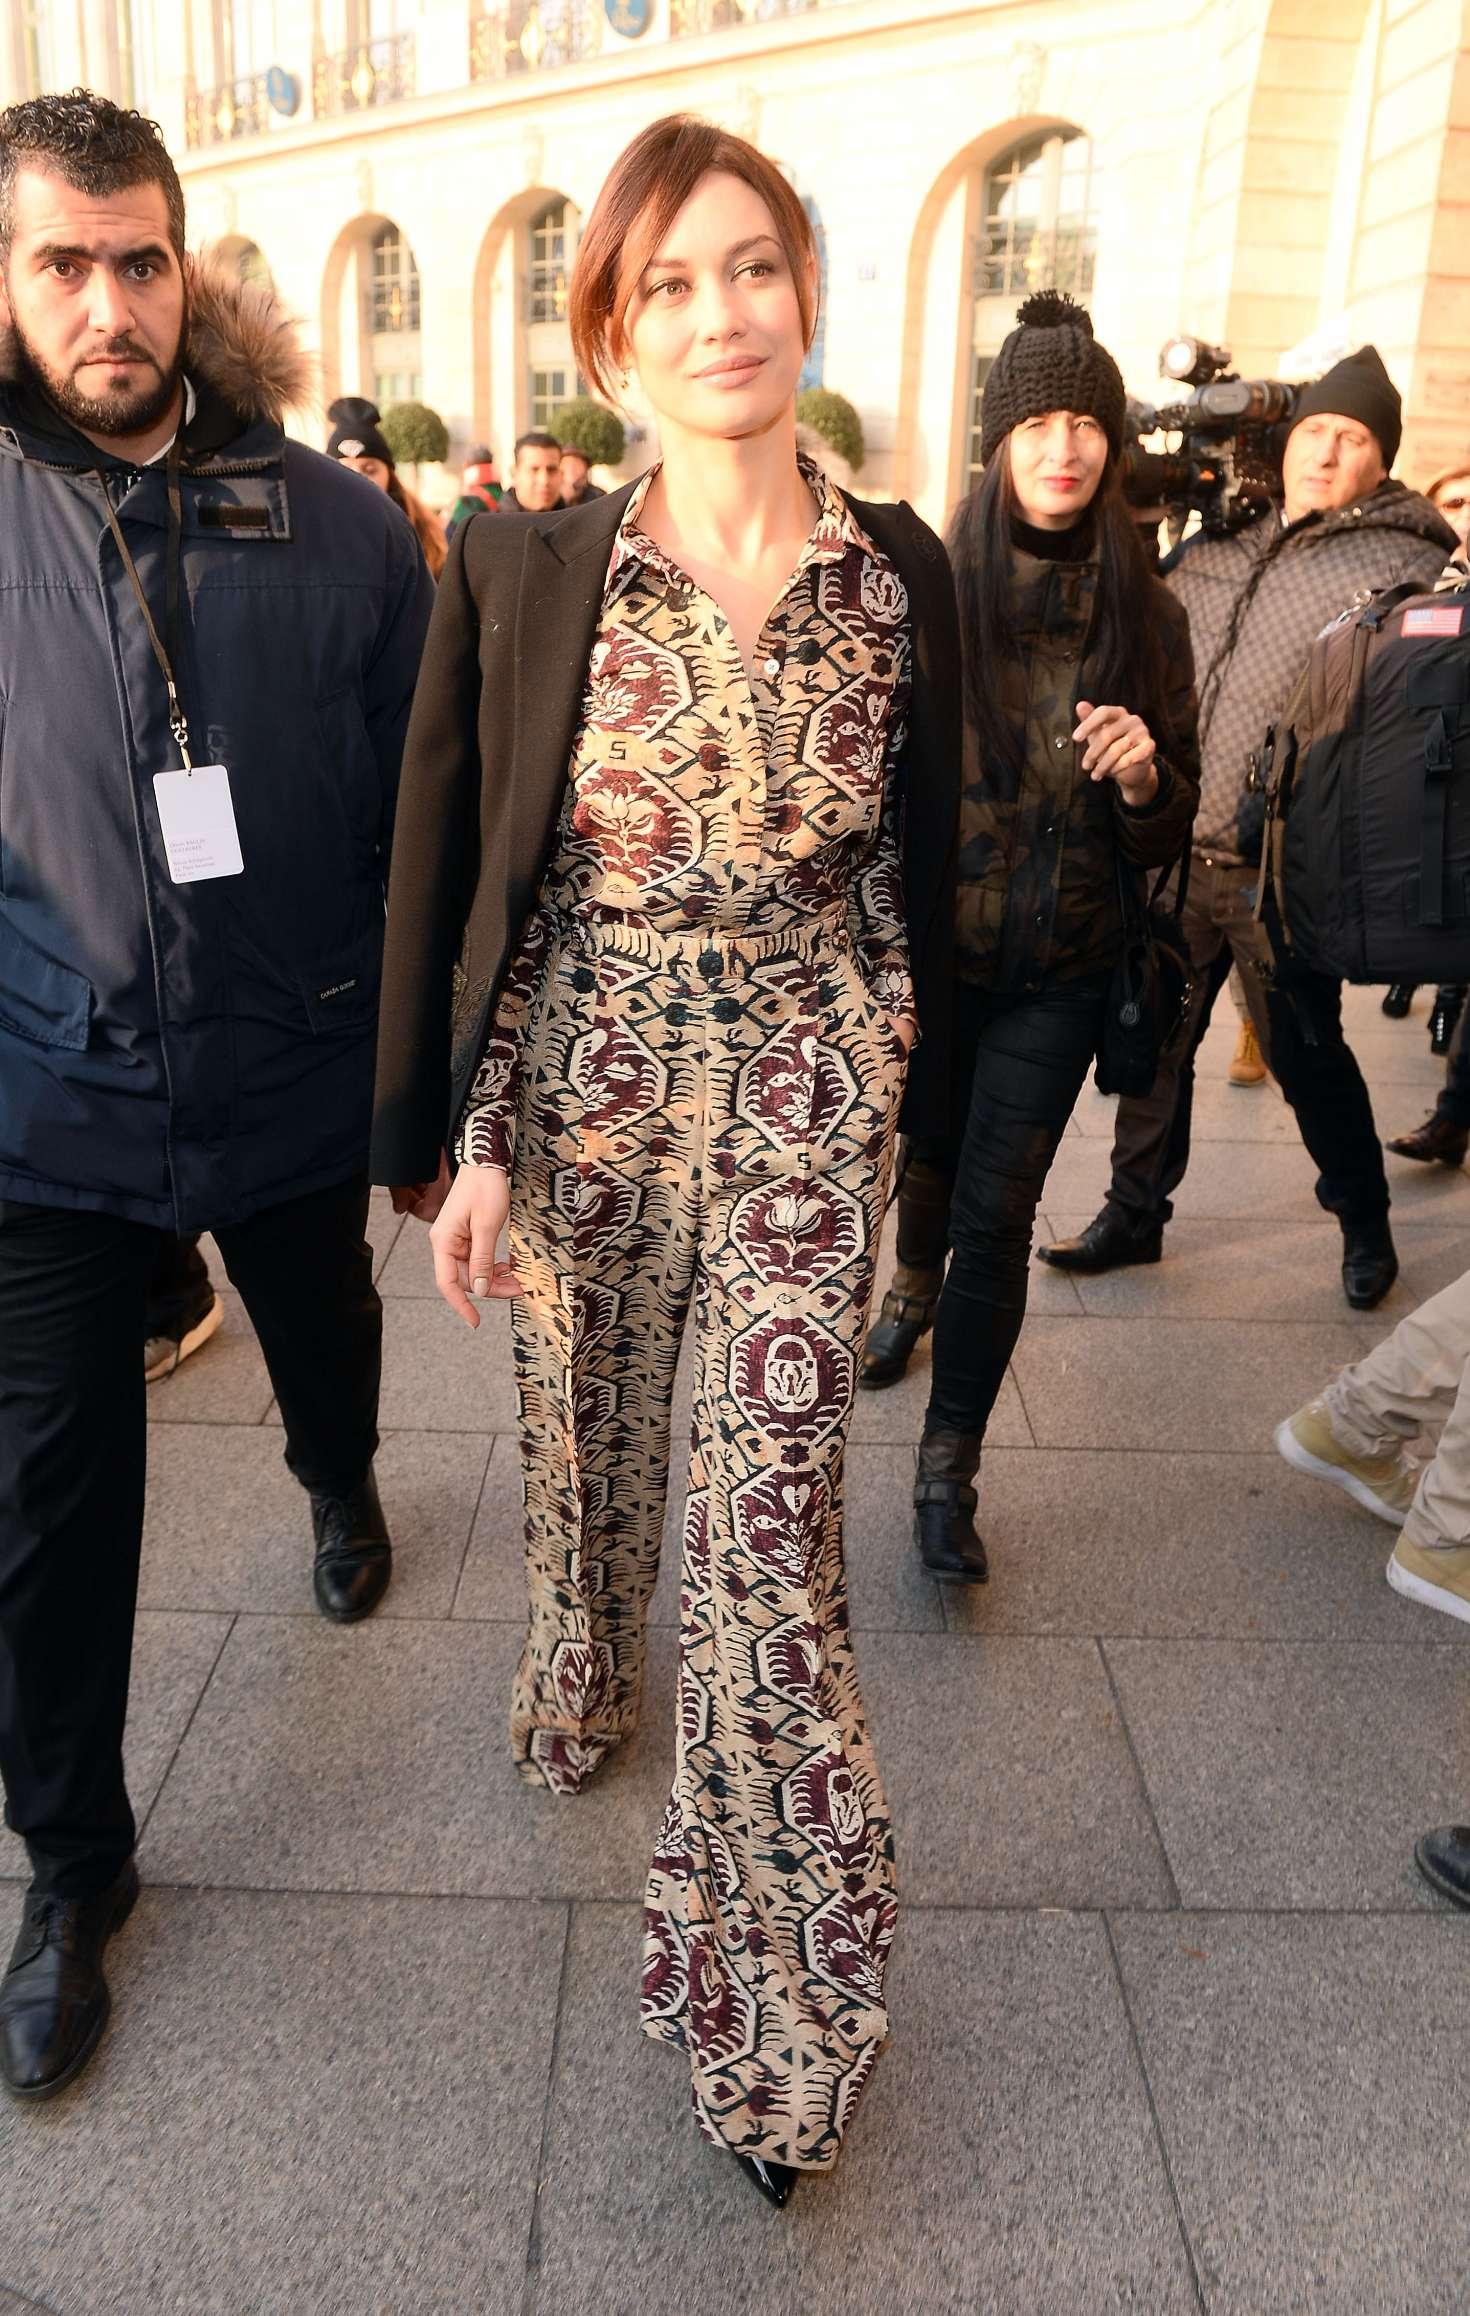 Olga Kurylenko - Arrives at Schiapparelli Fashion Show 2017 in Paris